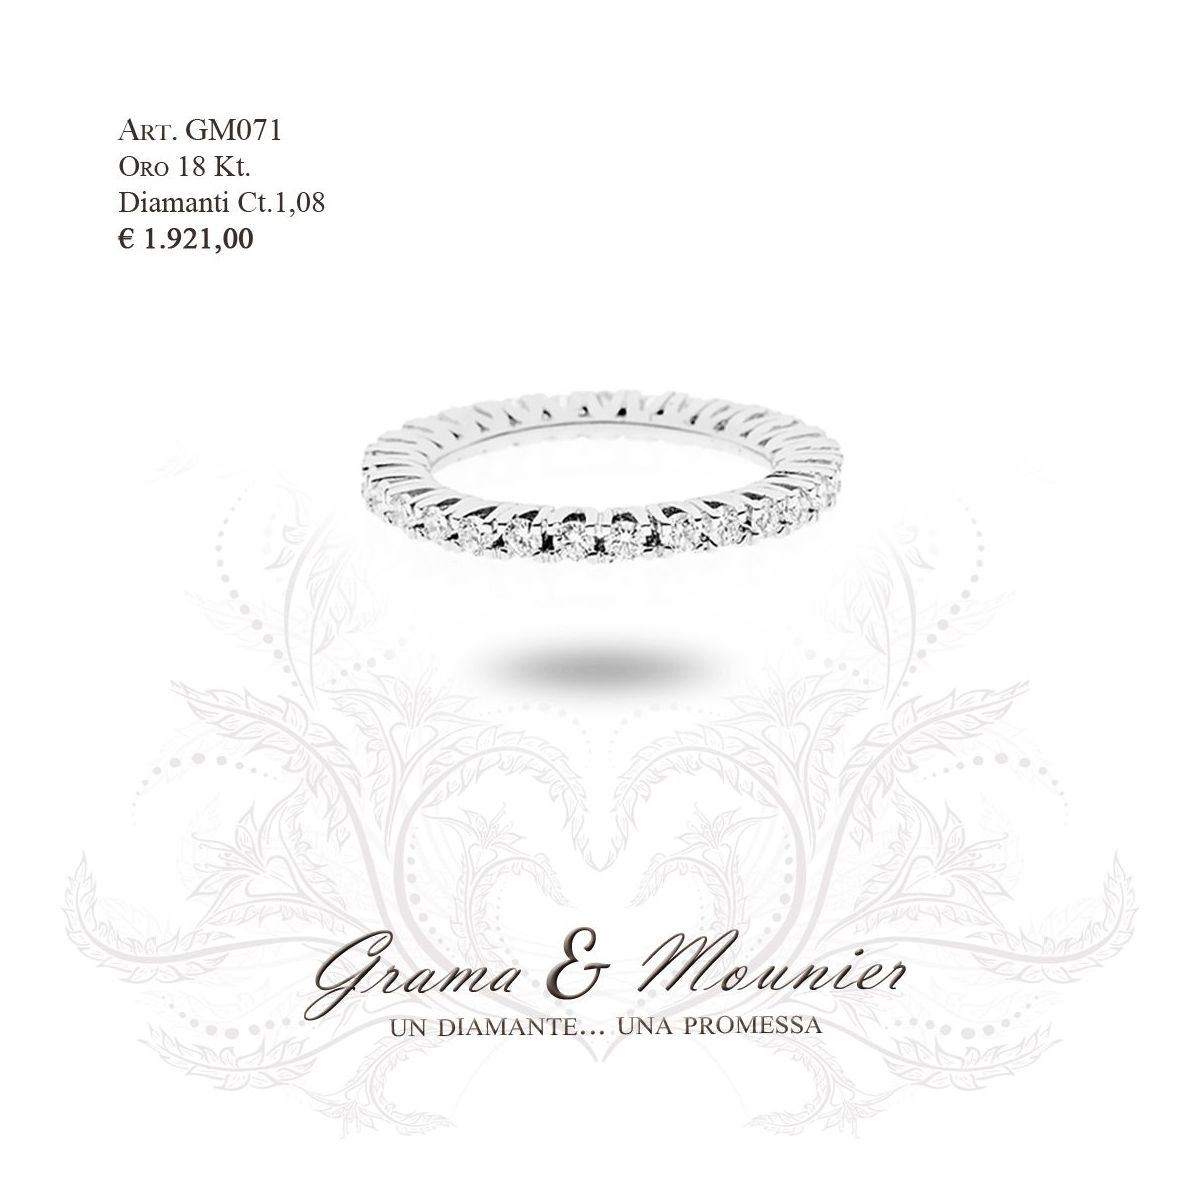 Anello in oro 18Kt. Grama&Mounier Art.GM071/16/17